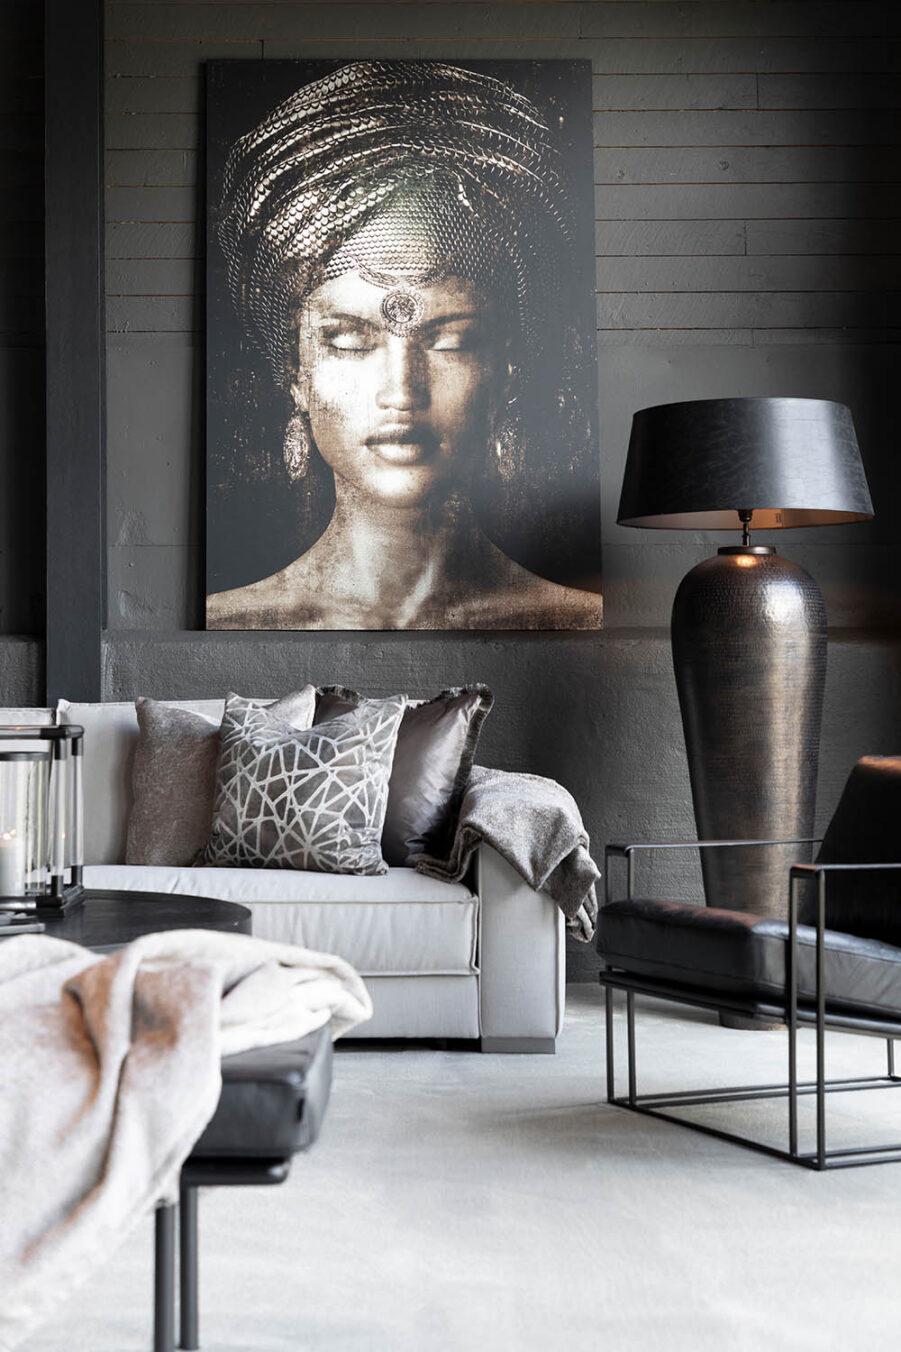 Artwood Glamour Girl Sepia GN8488 väggdekoration